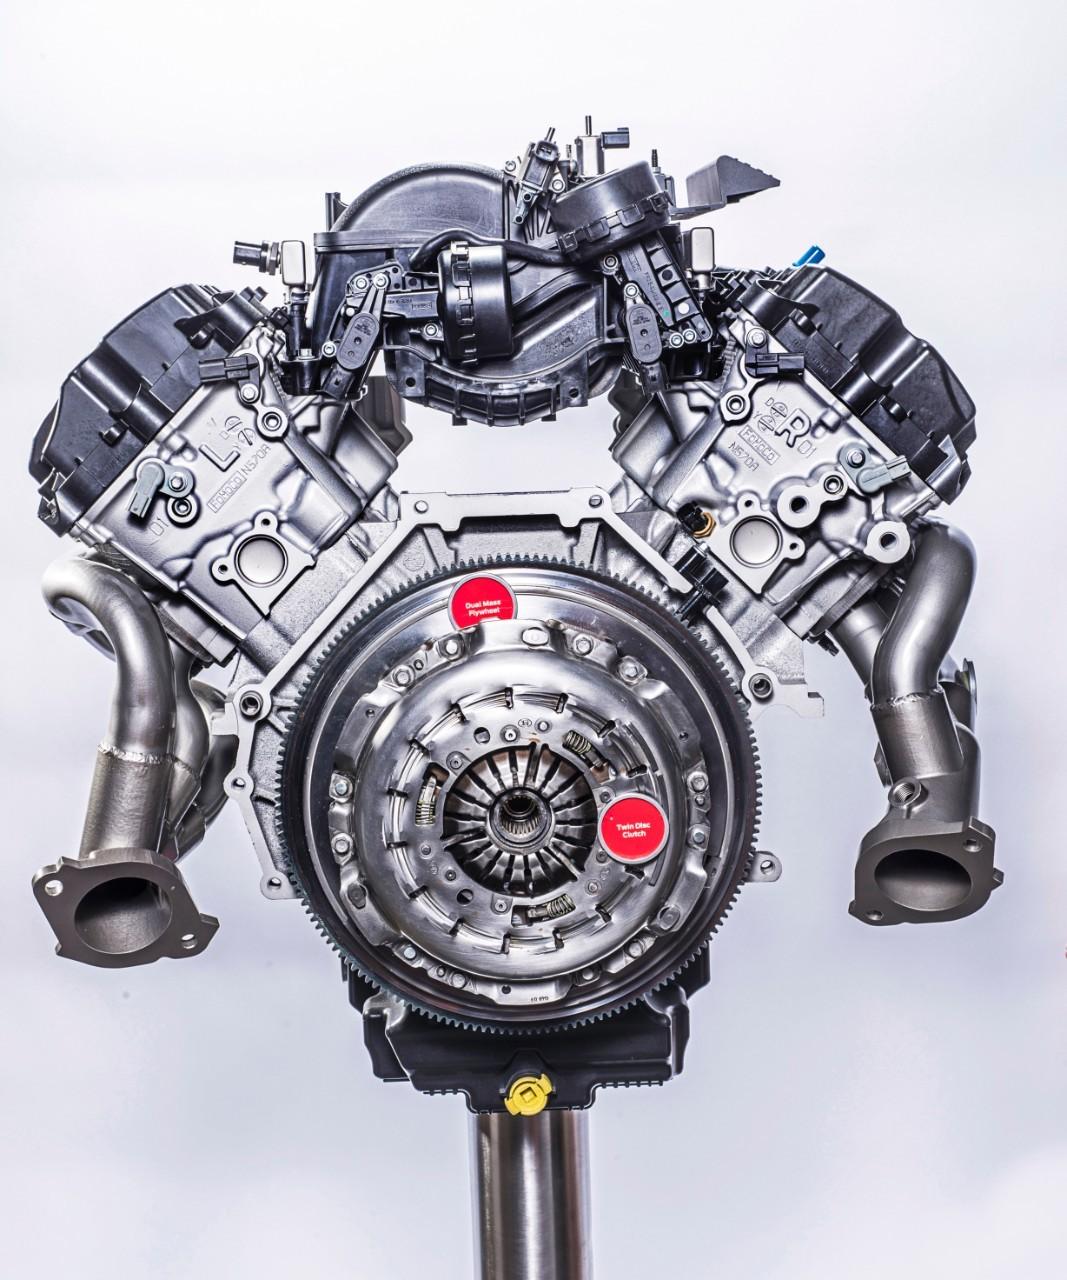 2016 Shelby GT350 Mustang Develops 526 Horsepower – Video ...